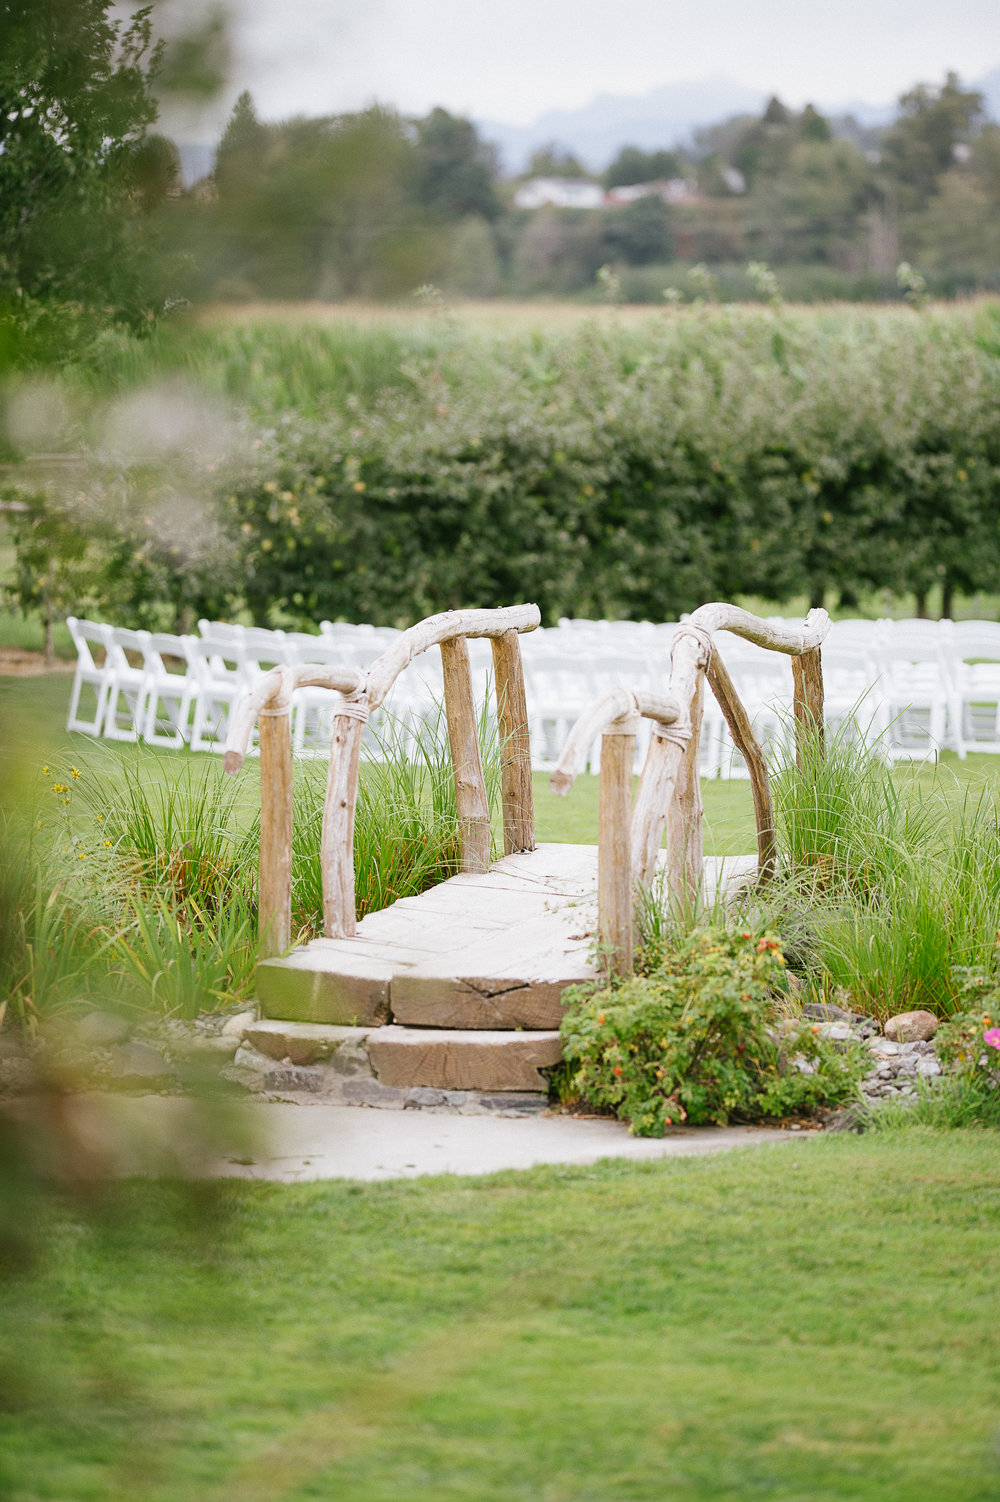 Swan Trail Farm Wedding_Sarah Schurman + Brian Skadan_Snohomish Wedding_Kelsey Lane Photography-5527.jpg